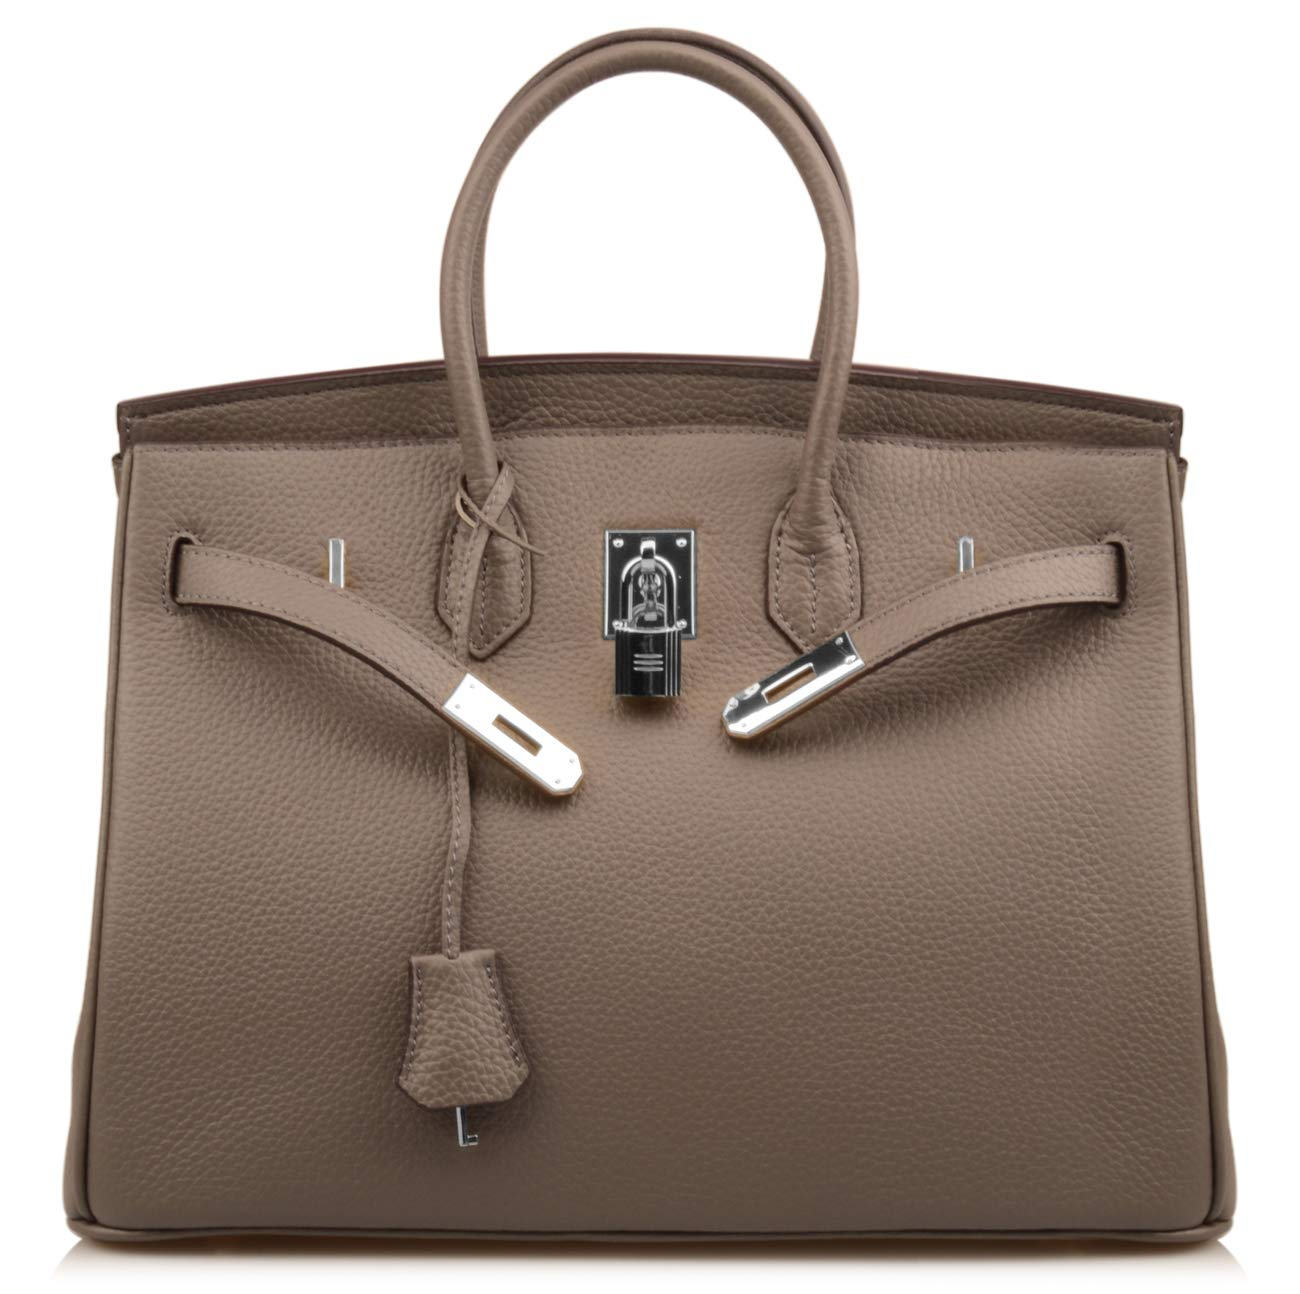 Qidell Women's Padlock Handbags With Silver Hardware On Clearance (35 cm.Dark grey)